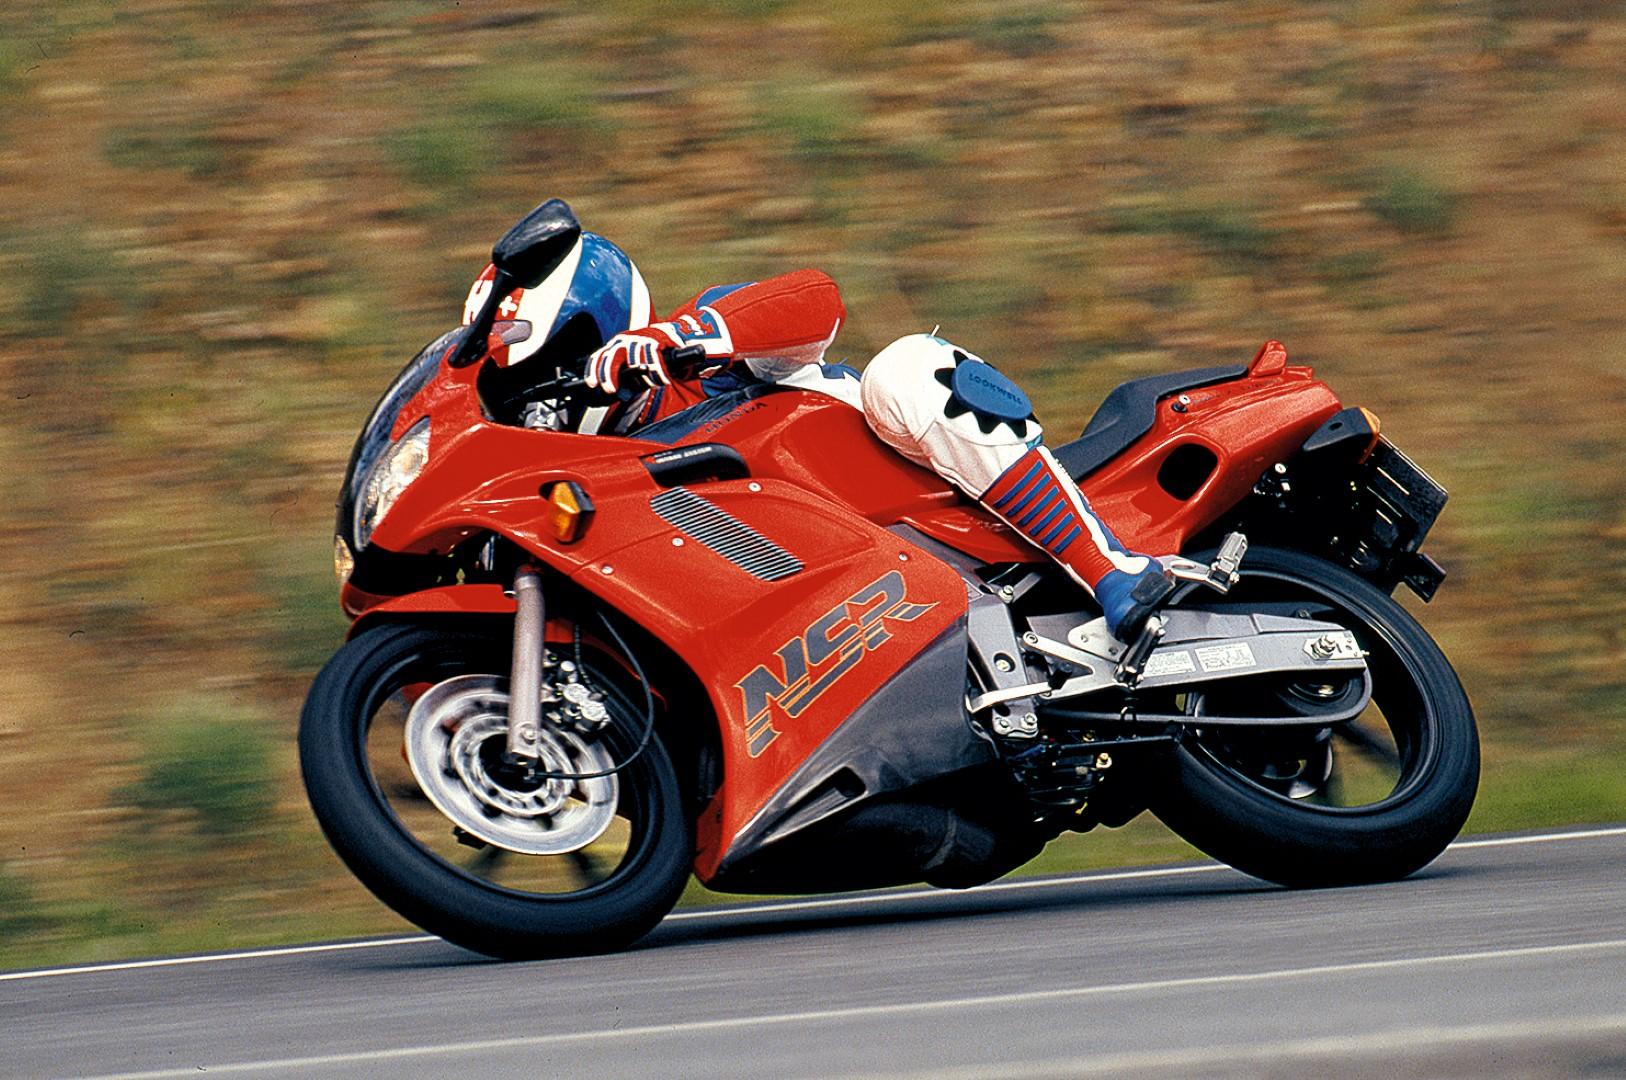 a12a2a85779 Aquellas motos deportivas de 125 cc | Noticias | Motociclismo.es